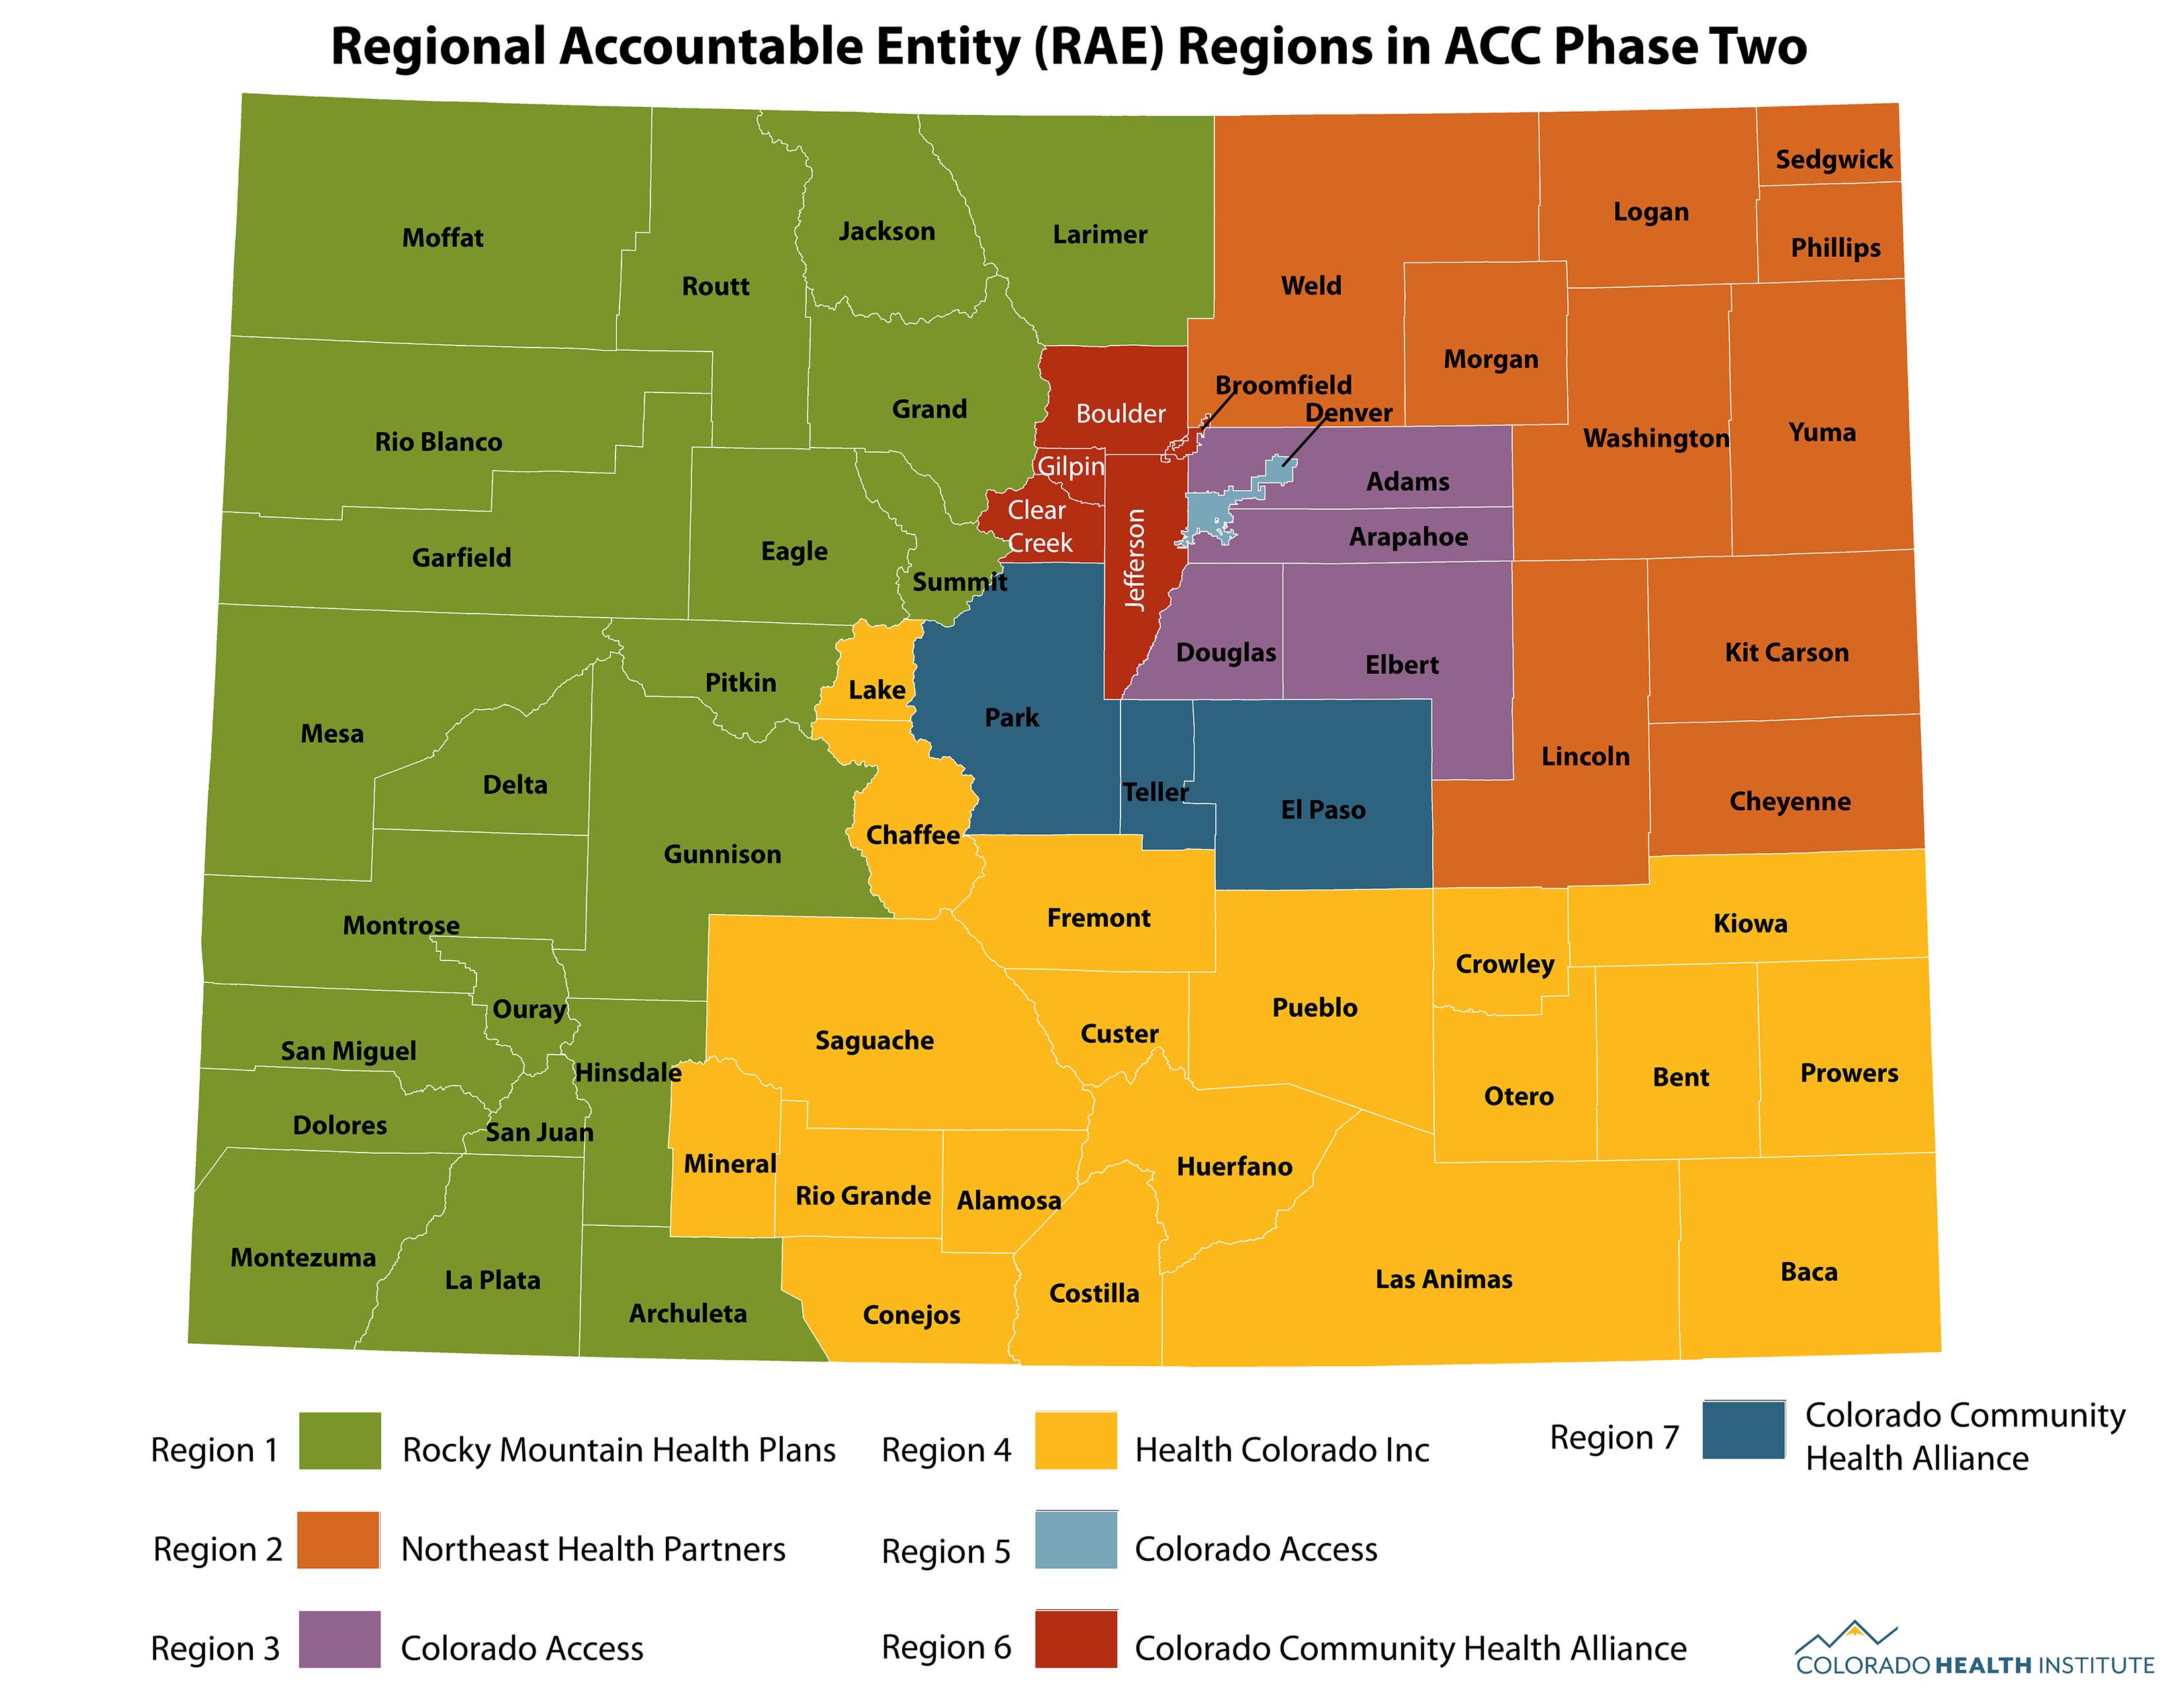 RAE regions map